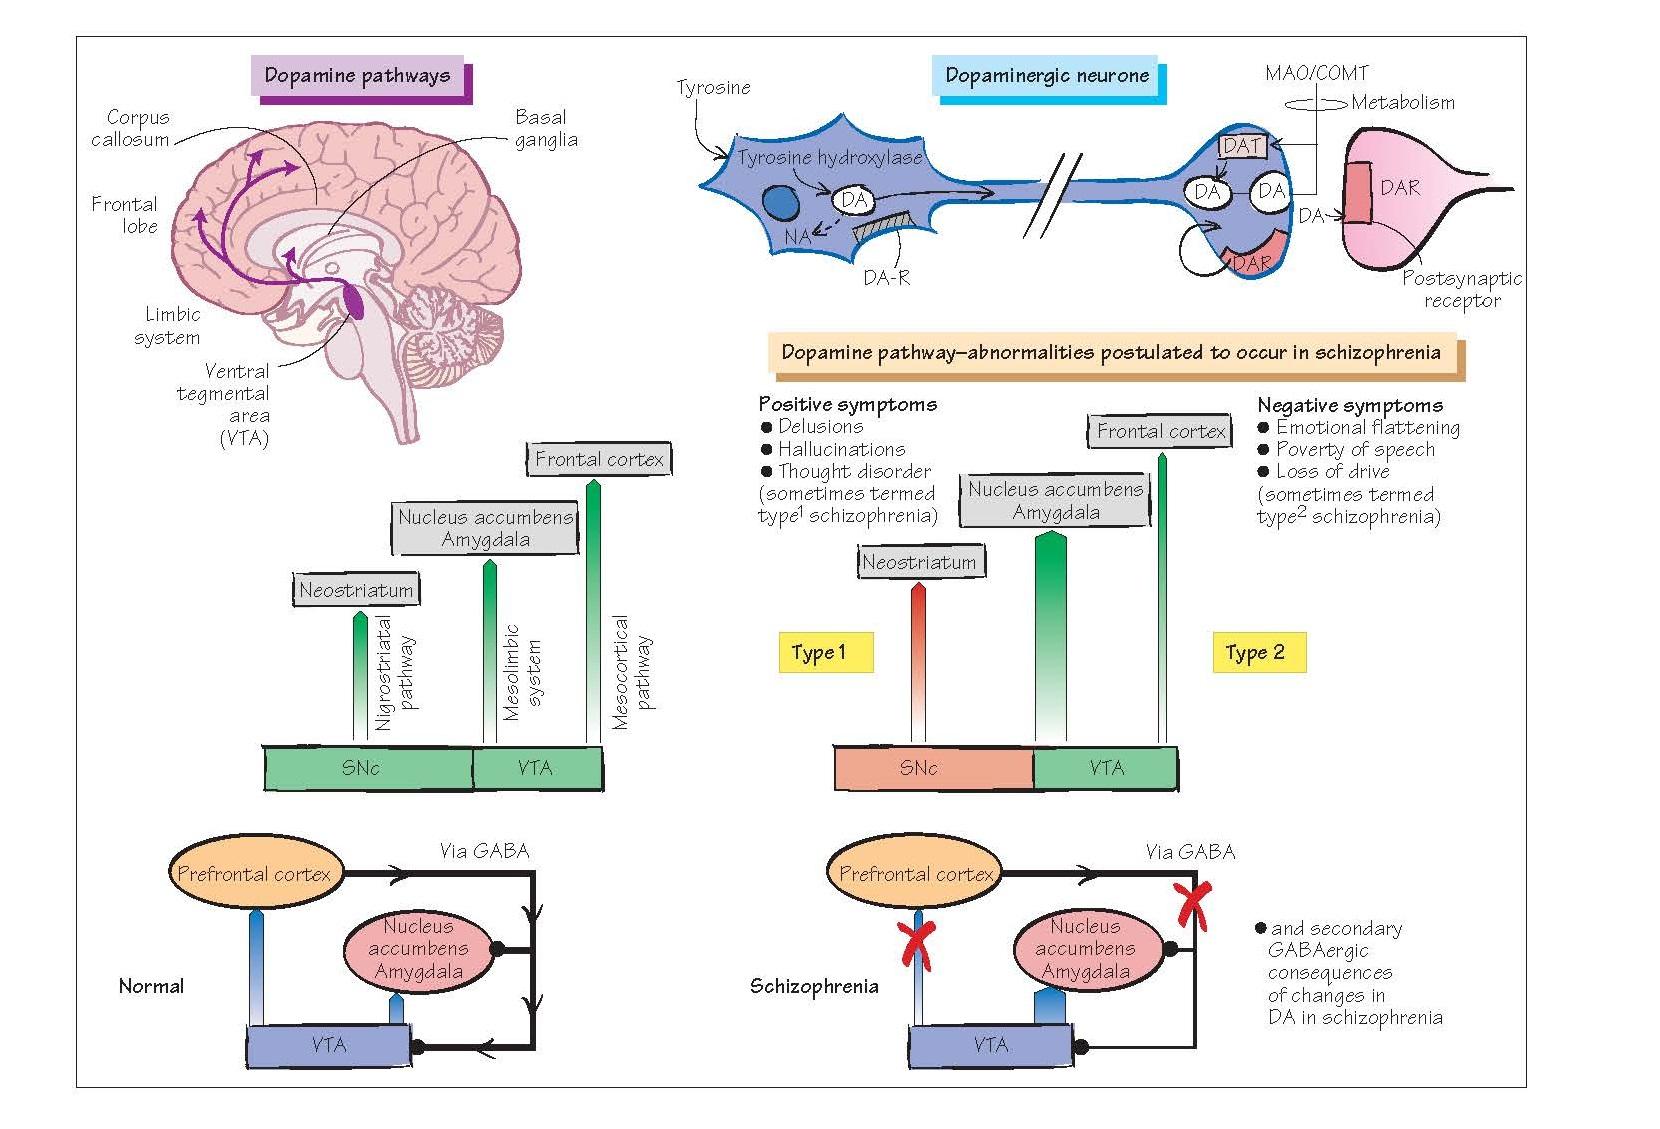 Neurochemical Disorders II: Schizophrenia, delusions, hallucinations, The dopamine hypothesis of schizophrenia,